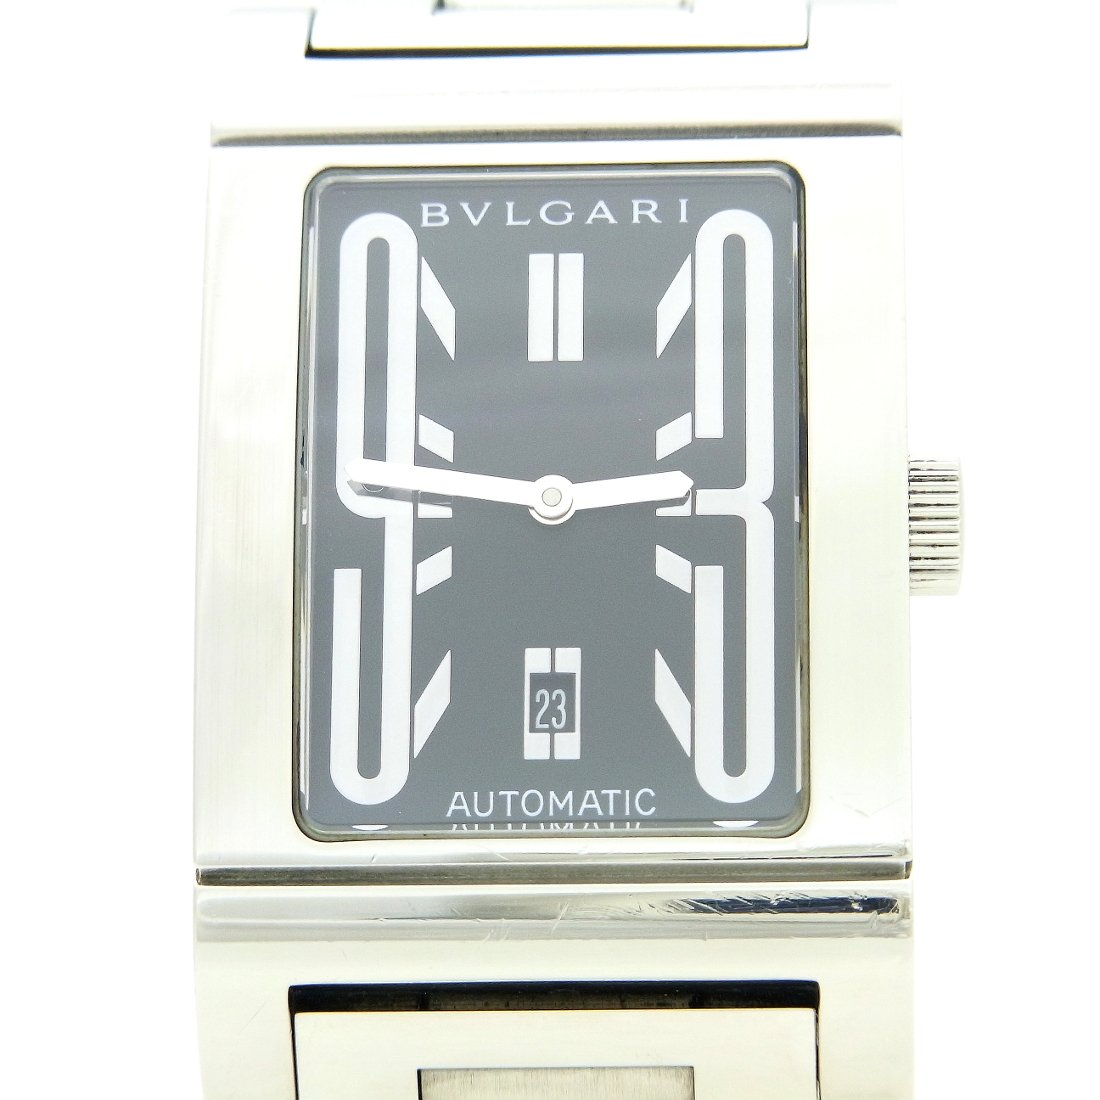 designer fashion be2f6 e097e Amazon   ブルガリ[BVLGARI] レッタンゴロ RT45S メンズ腕時計 ...